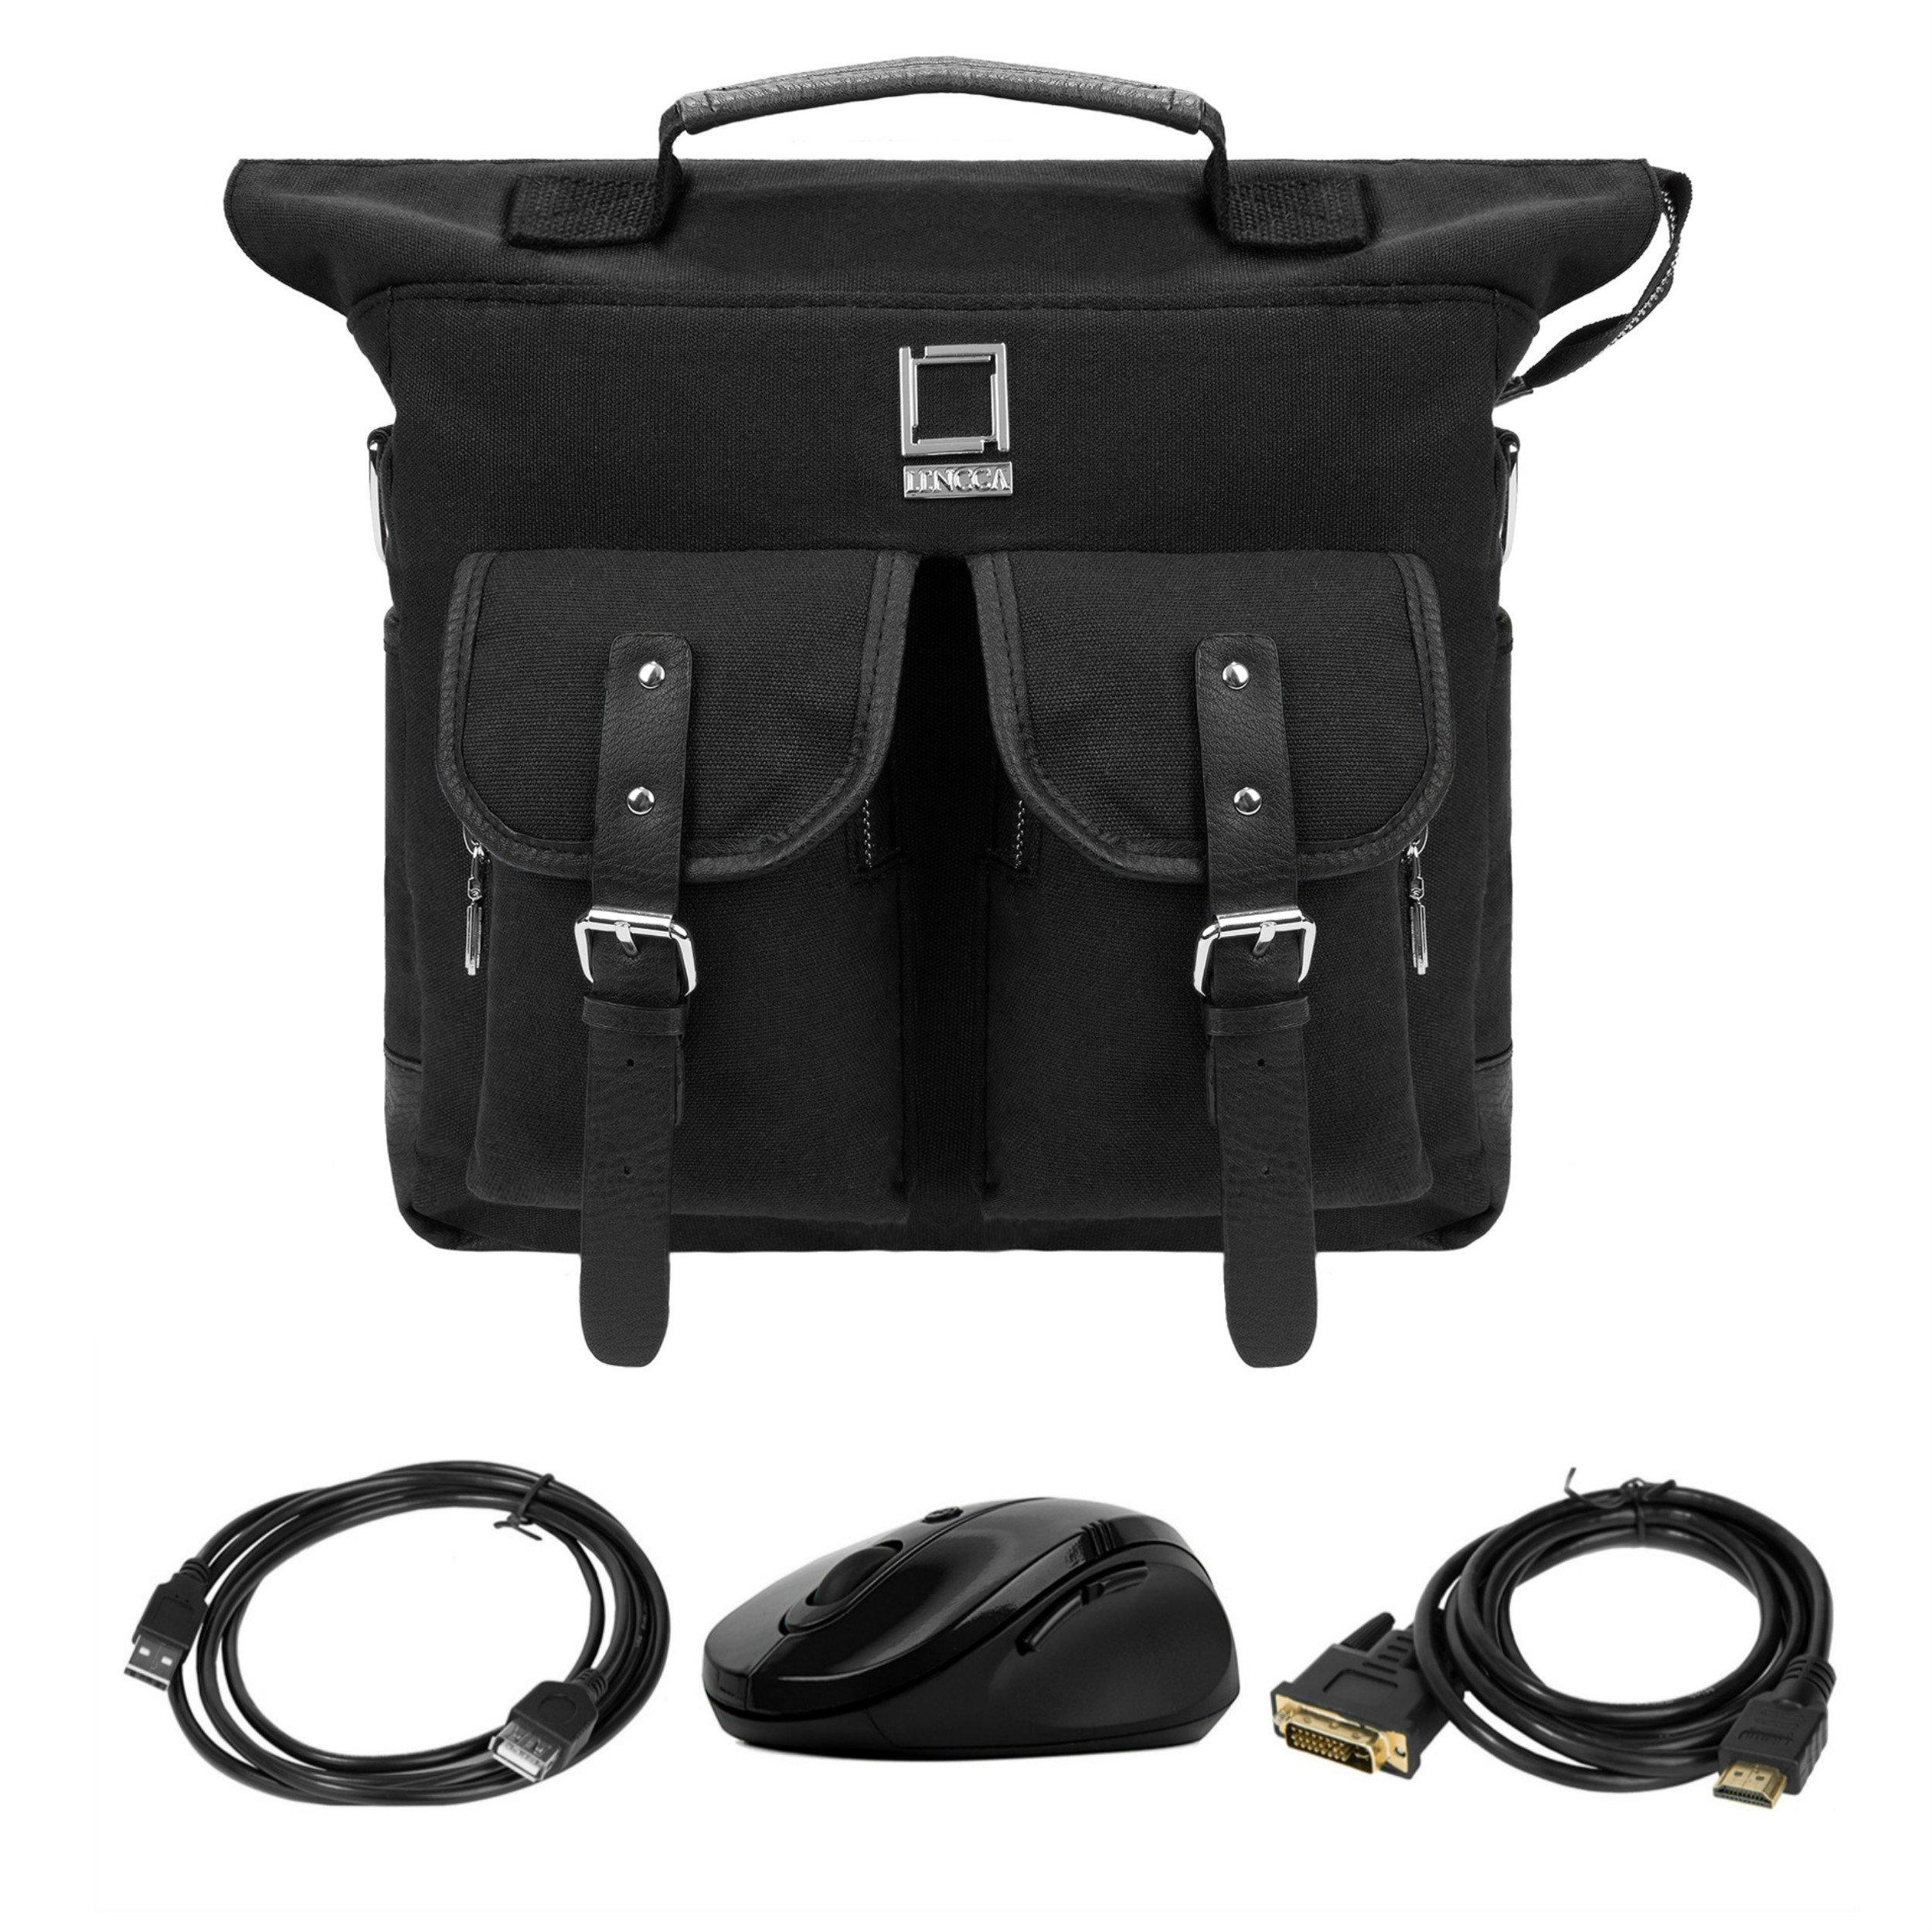 Lencca College Student Daypack / Satchel / Laptop Bag For Laptop Samsung Notebook 15.6'' Black & Computer Mouse & USB 2.0 Cable & HDMI Transfer